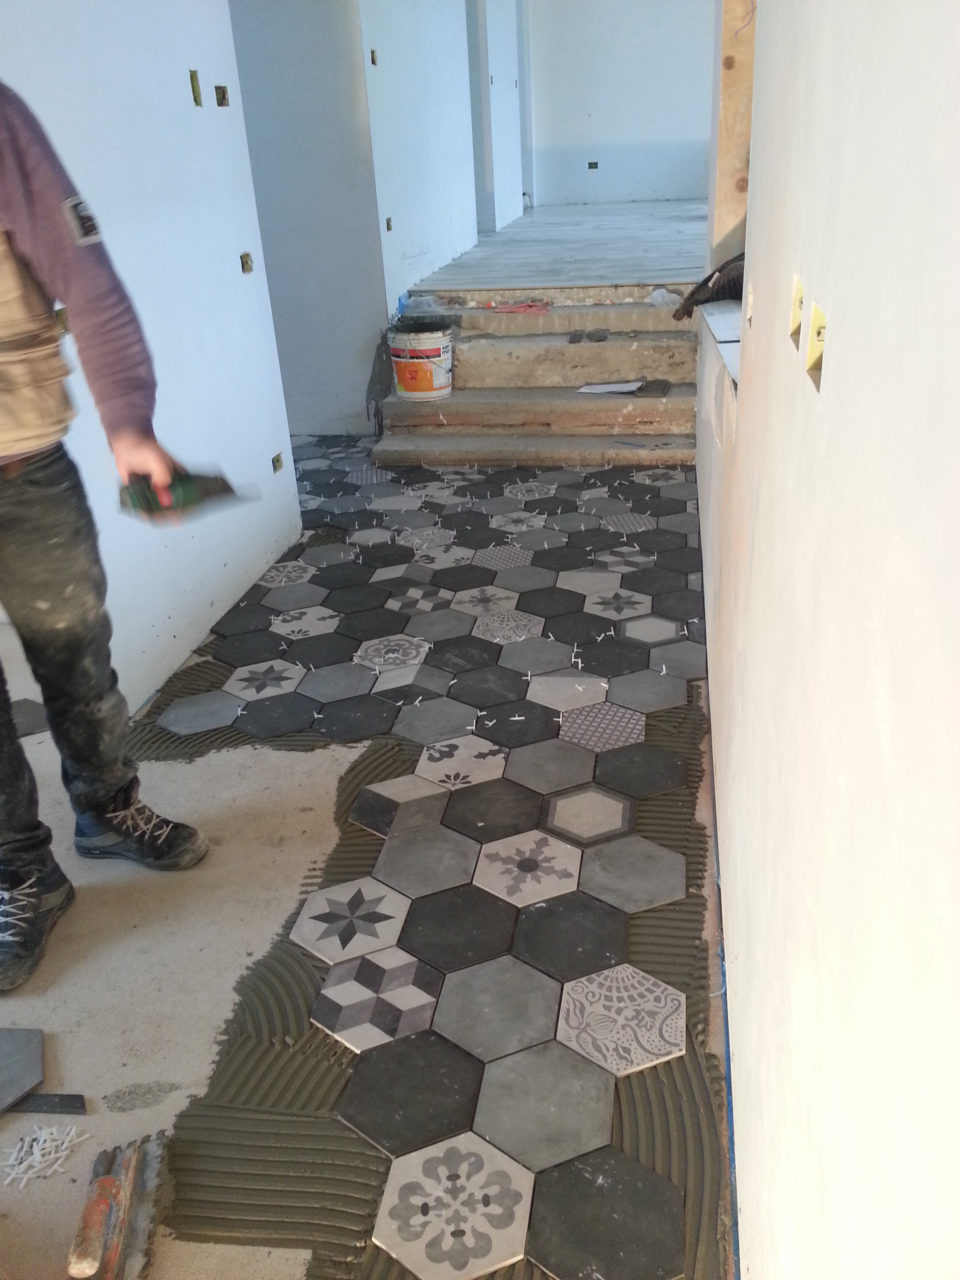 Mattonelle esagonali cucina good posa piastrelle for Piastrelle mosaico per cucina